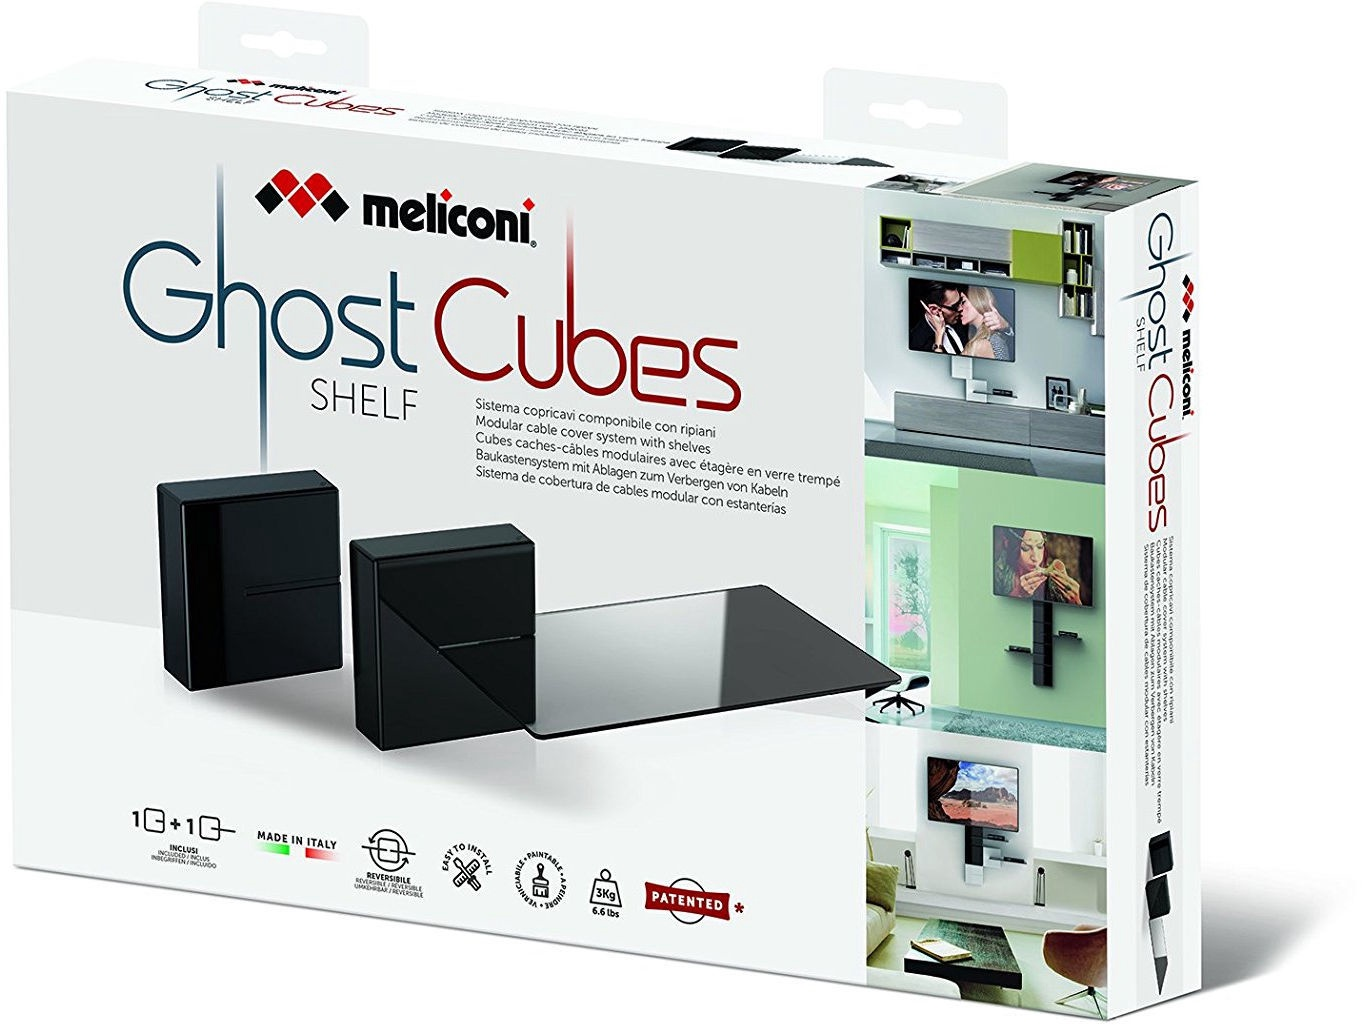 Meliconi Tv Meubel.Televizoriaus Laikiklis Meliconi Ghost Cubes Shelf Black